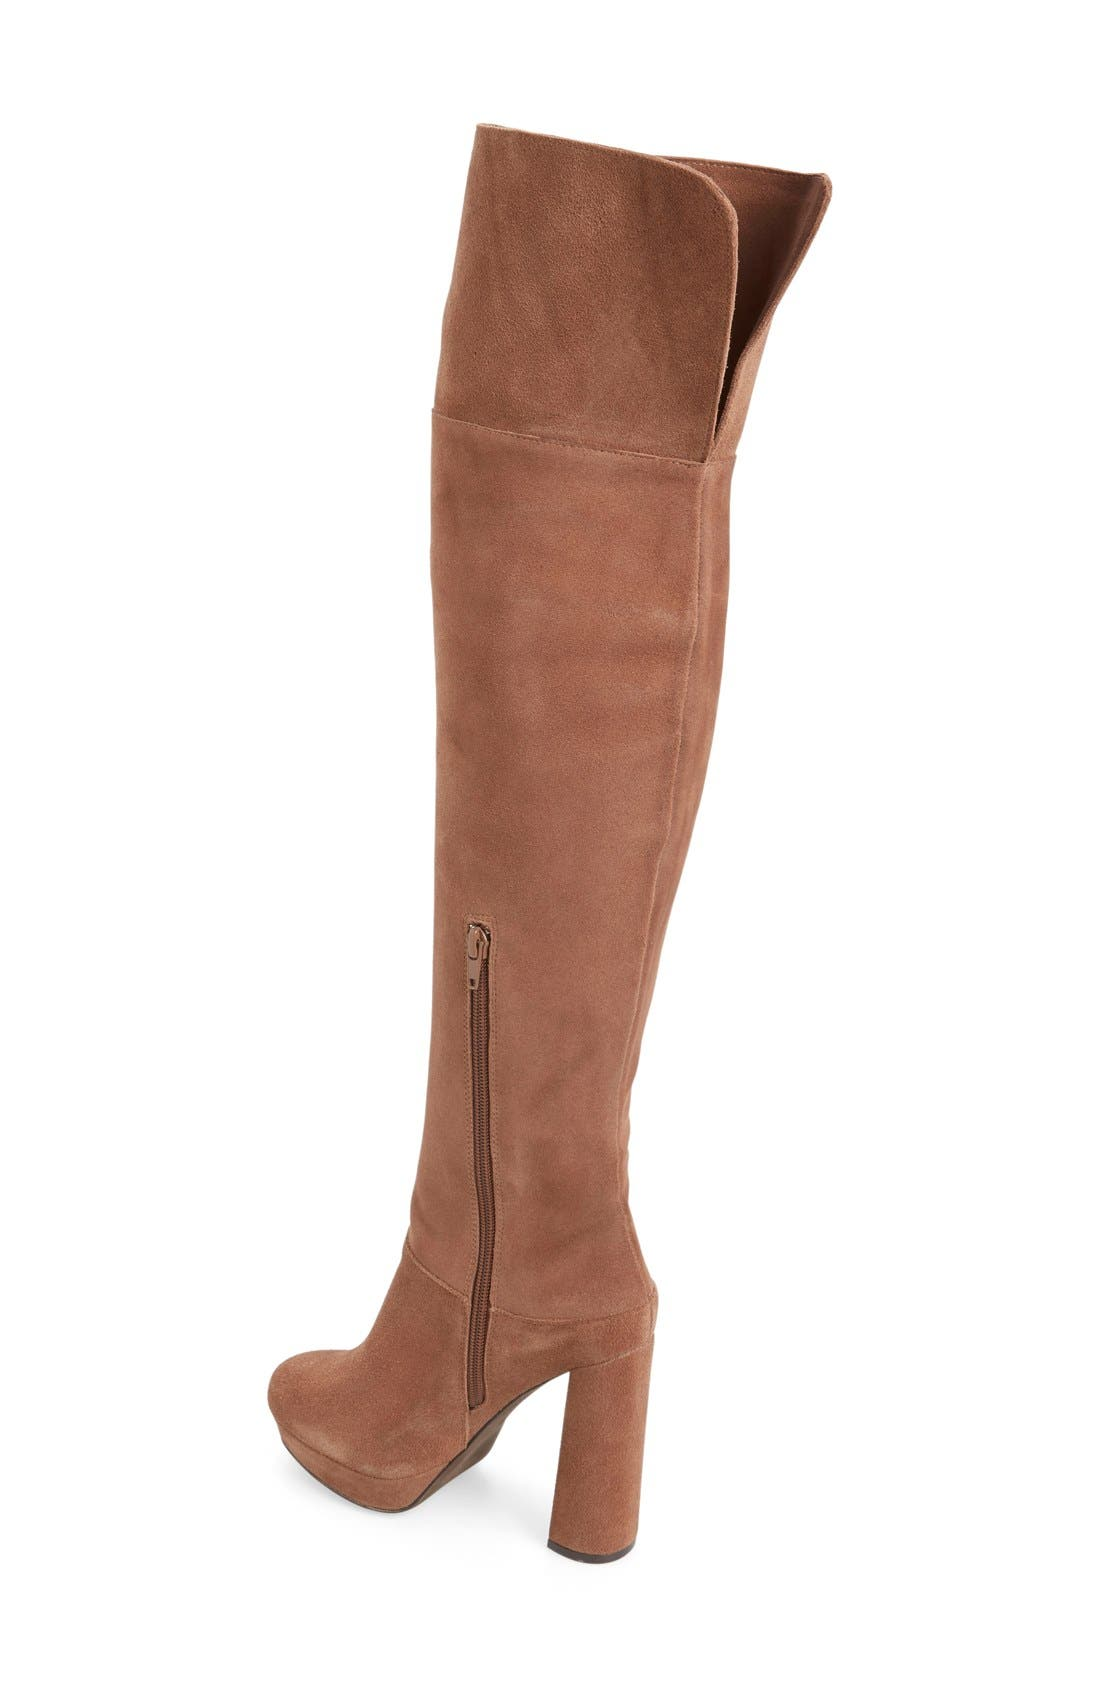 Alternate Image 2  - Jeffrey Campbell 'Destino' Over the Knee Platform Boot (Women)